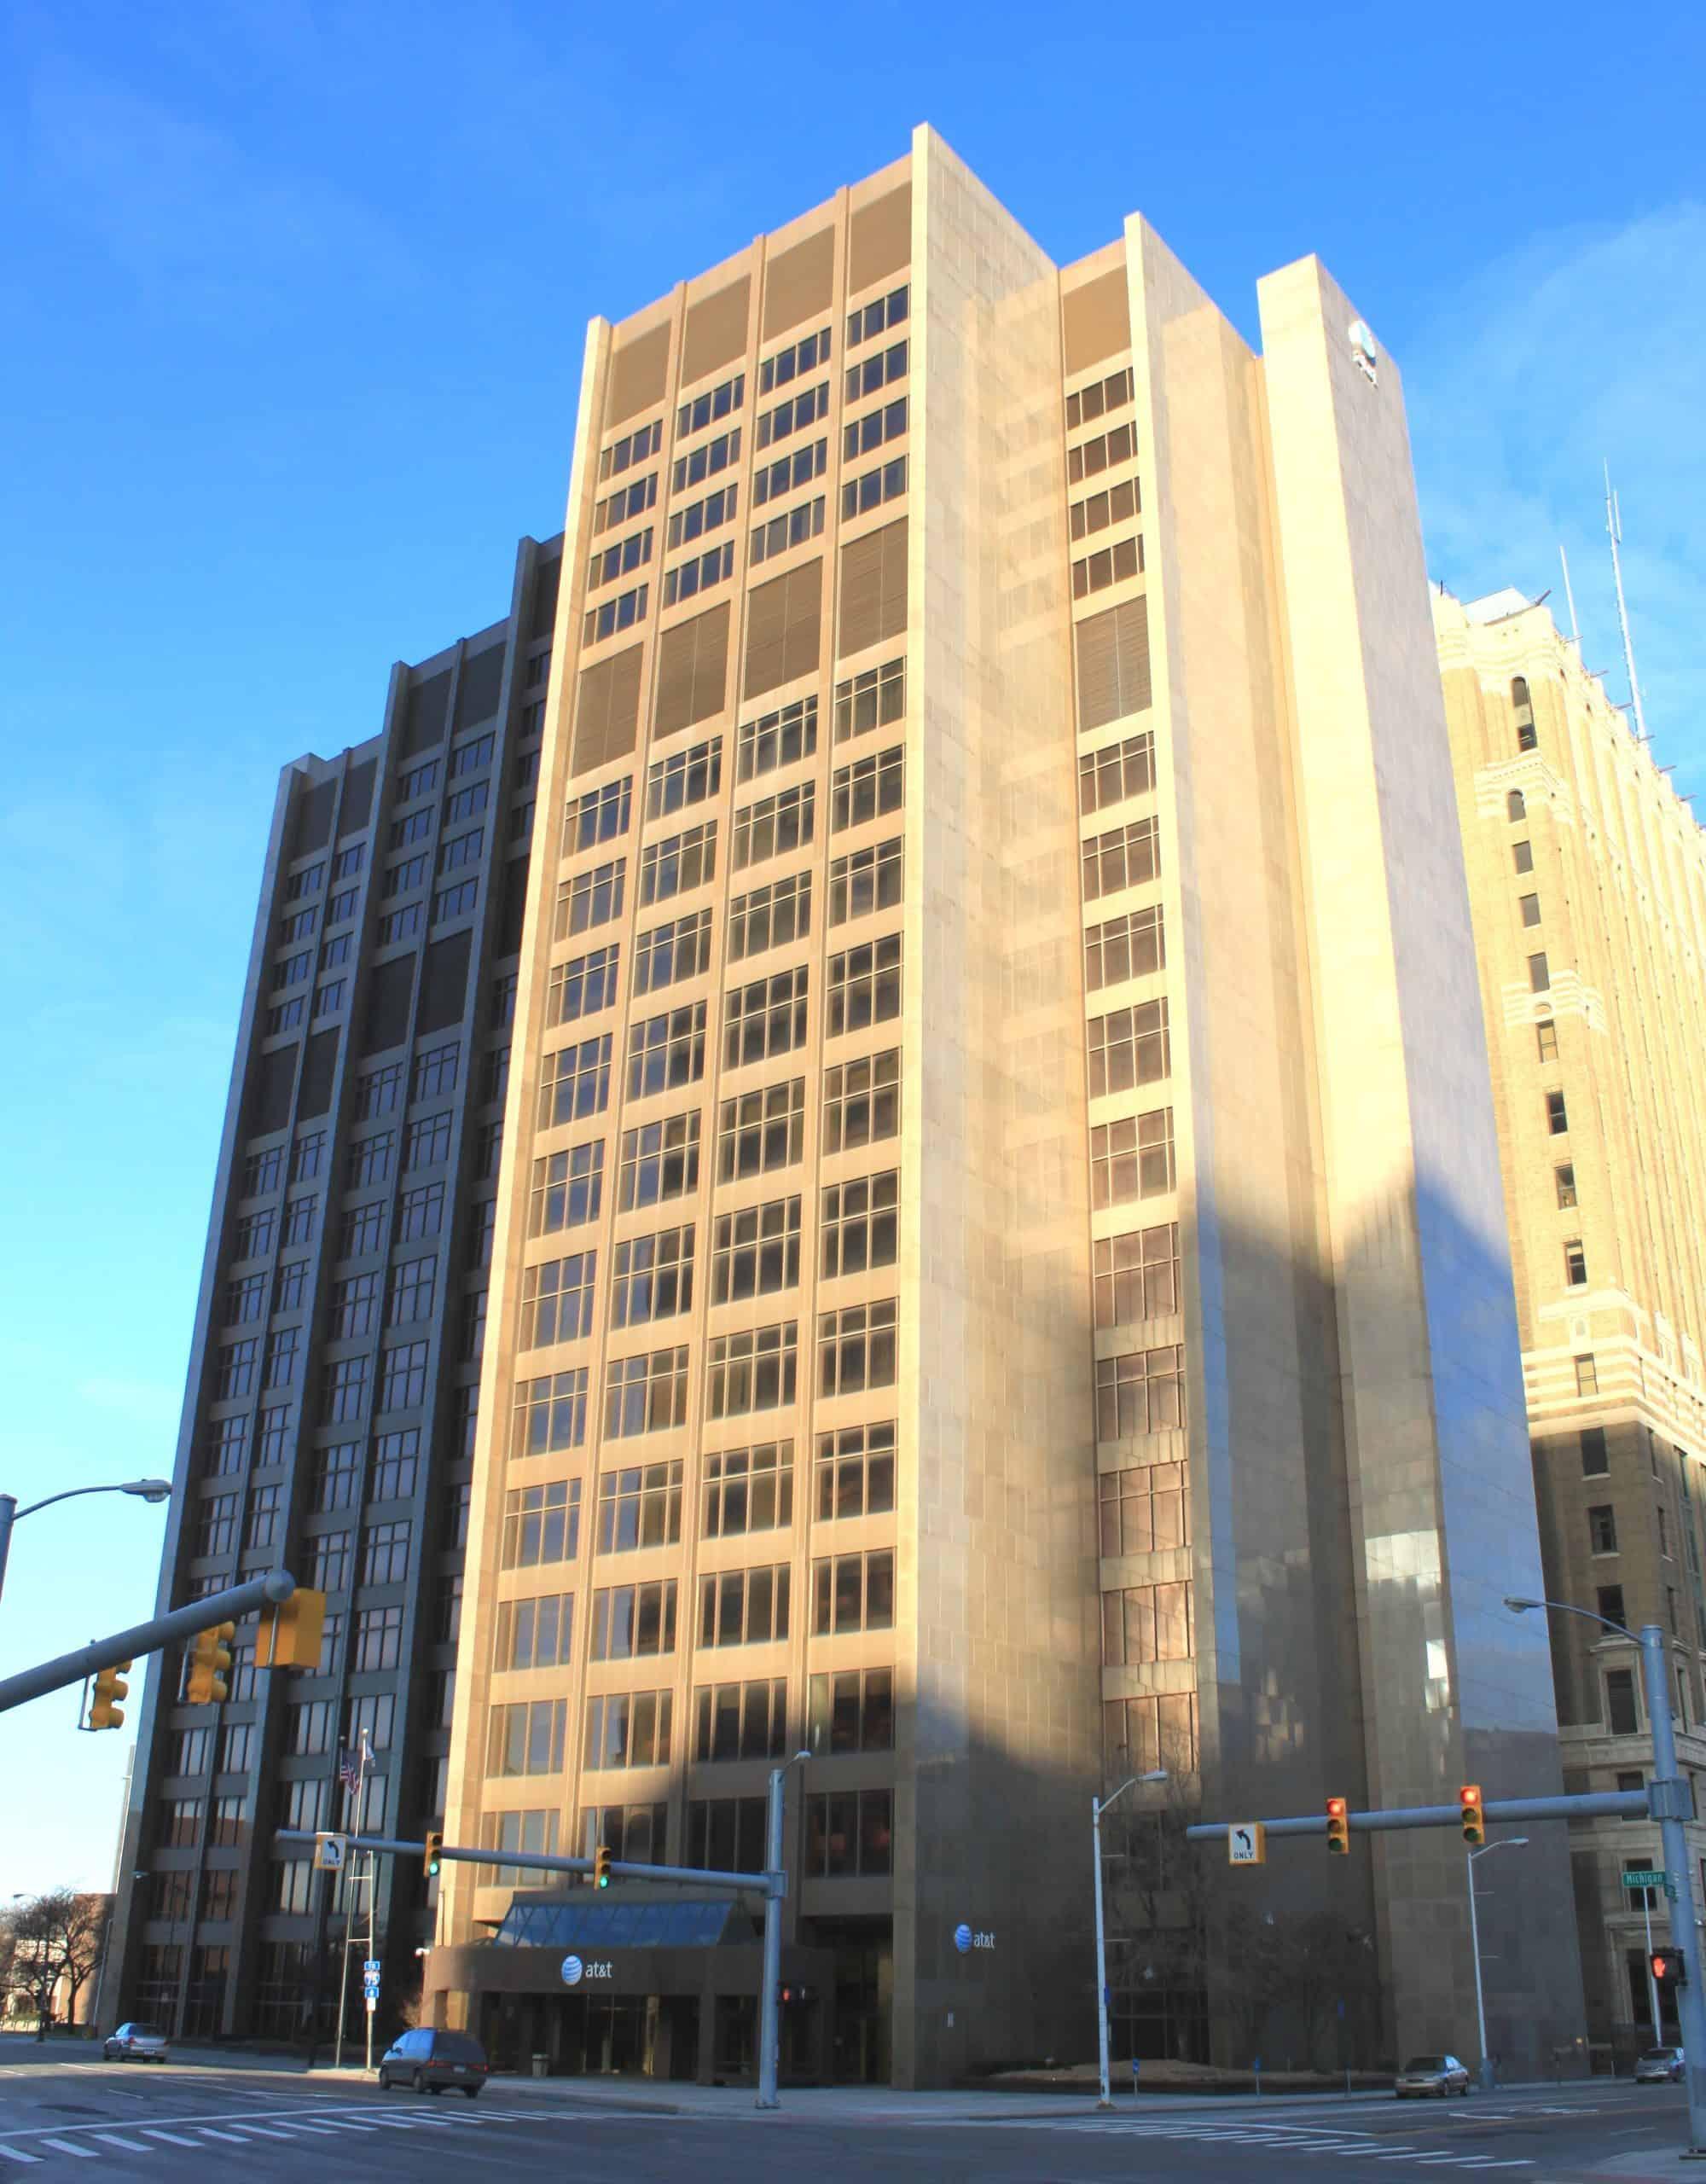 michigan_bell-at26t_headquarters_building_detroit_michigan-6773756